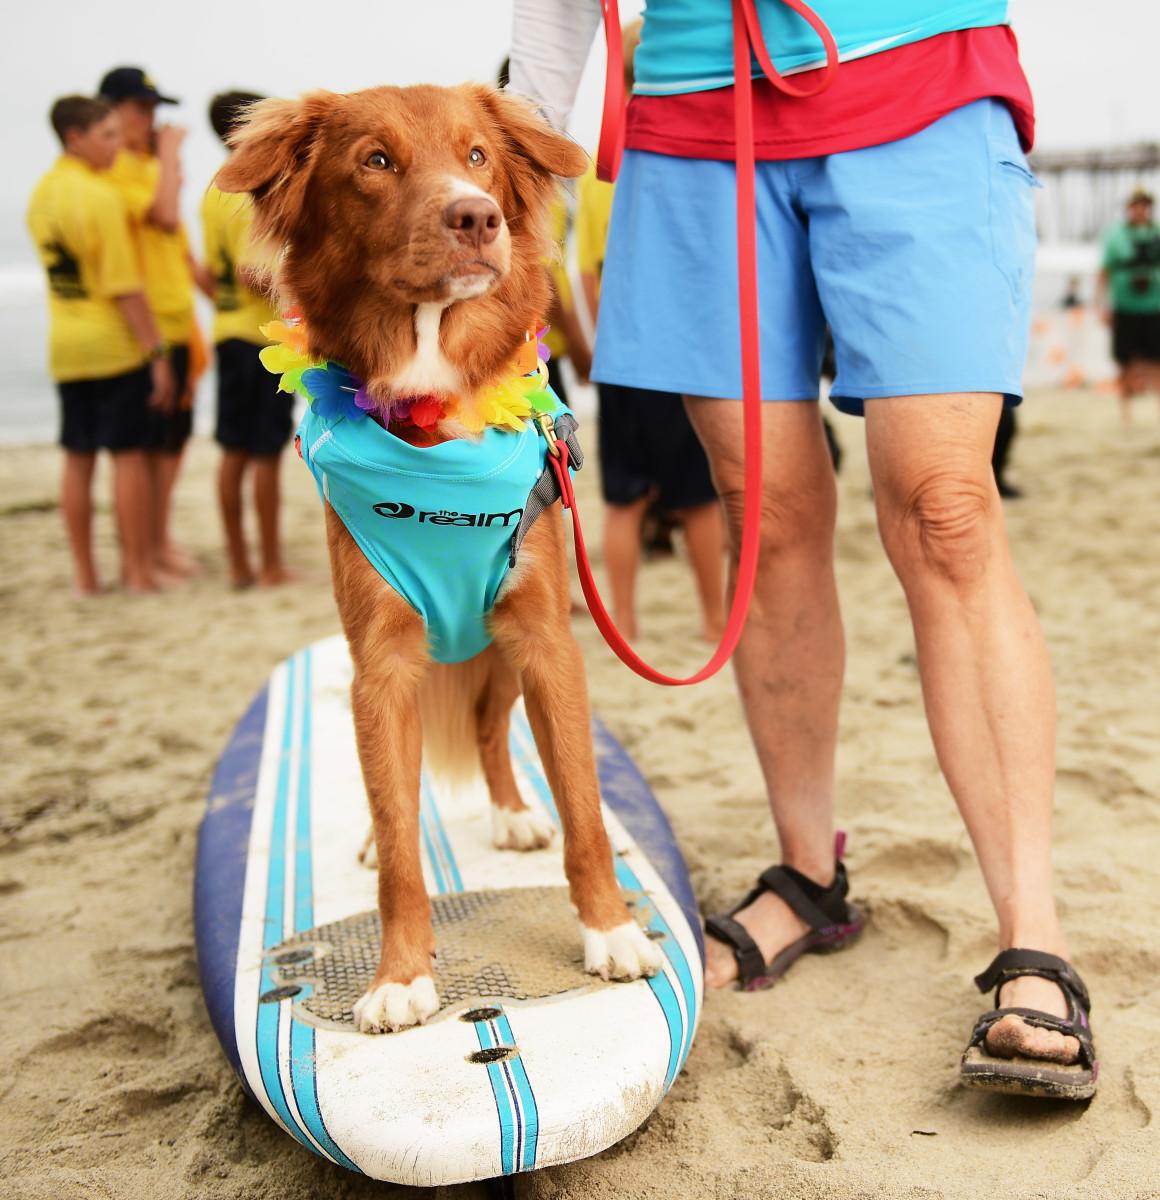 Surfing_Dogs_Gallery_031.jpg